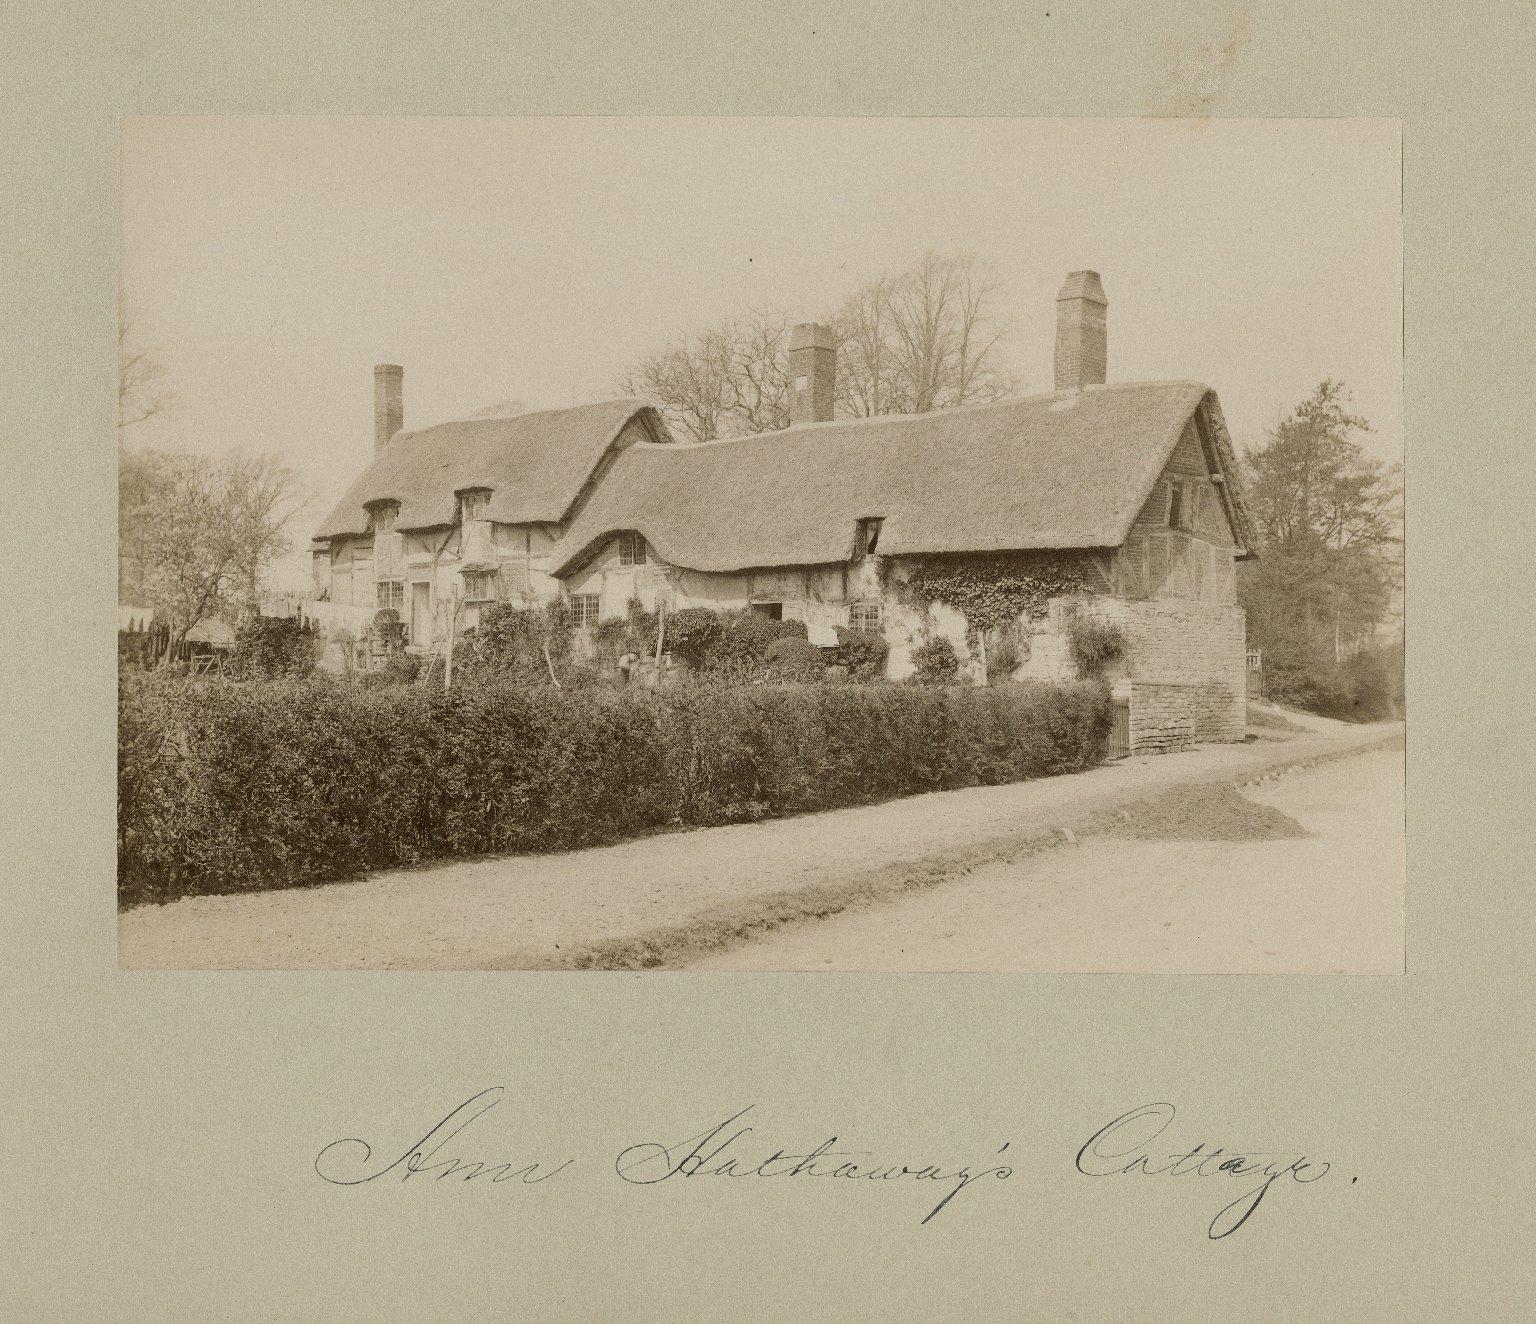 Anne Hathaway's cottage, exterior views [graphic].